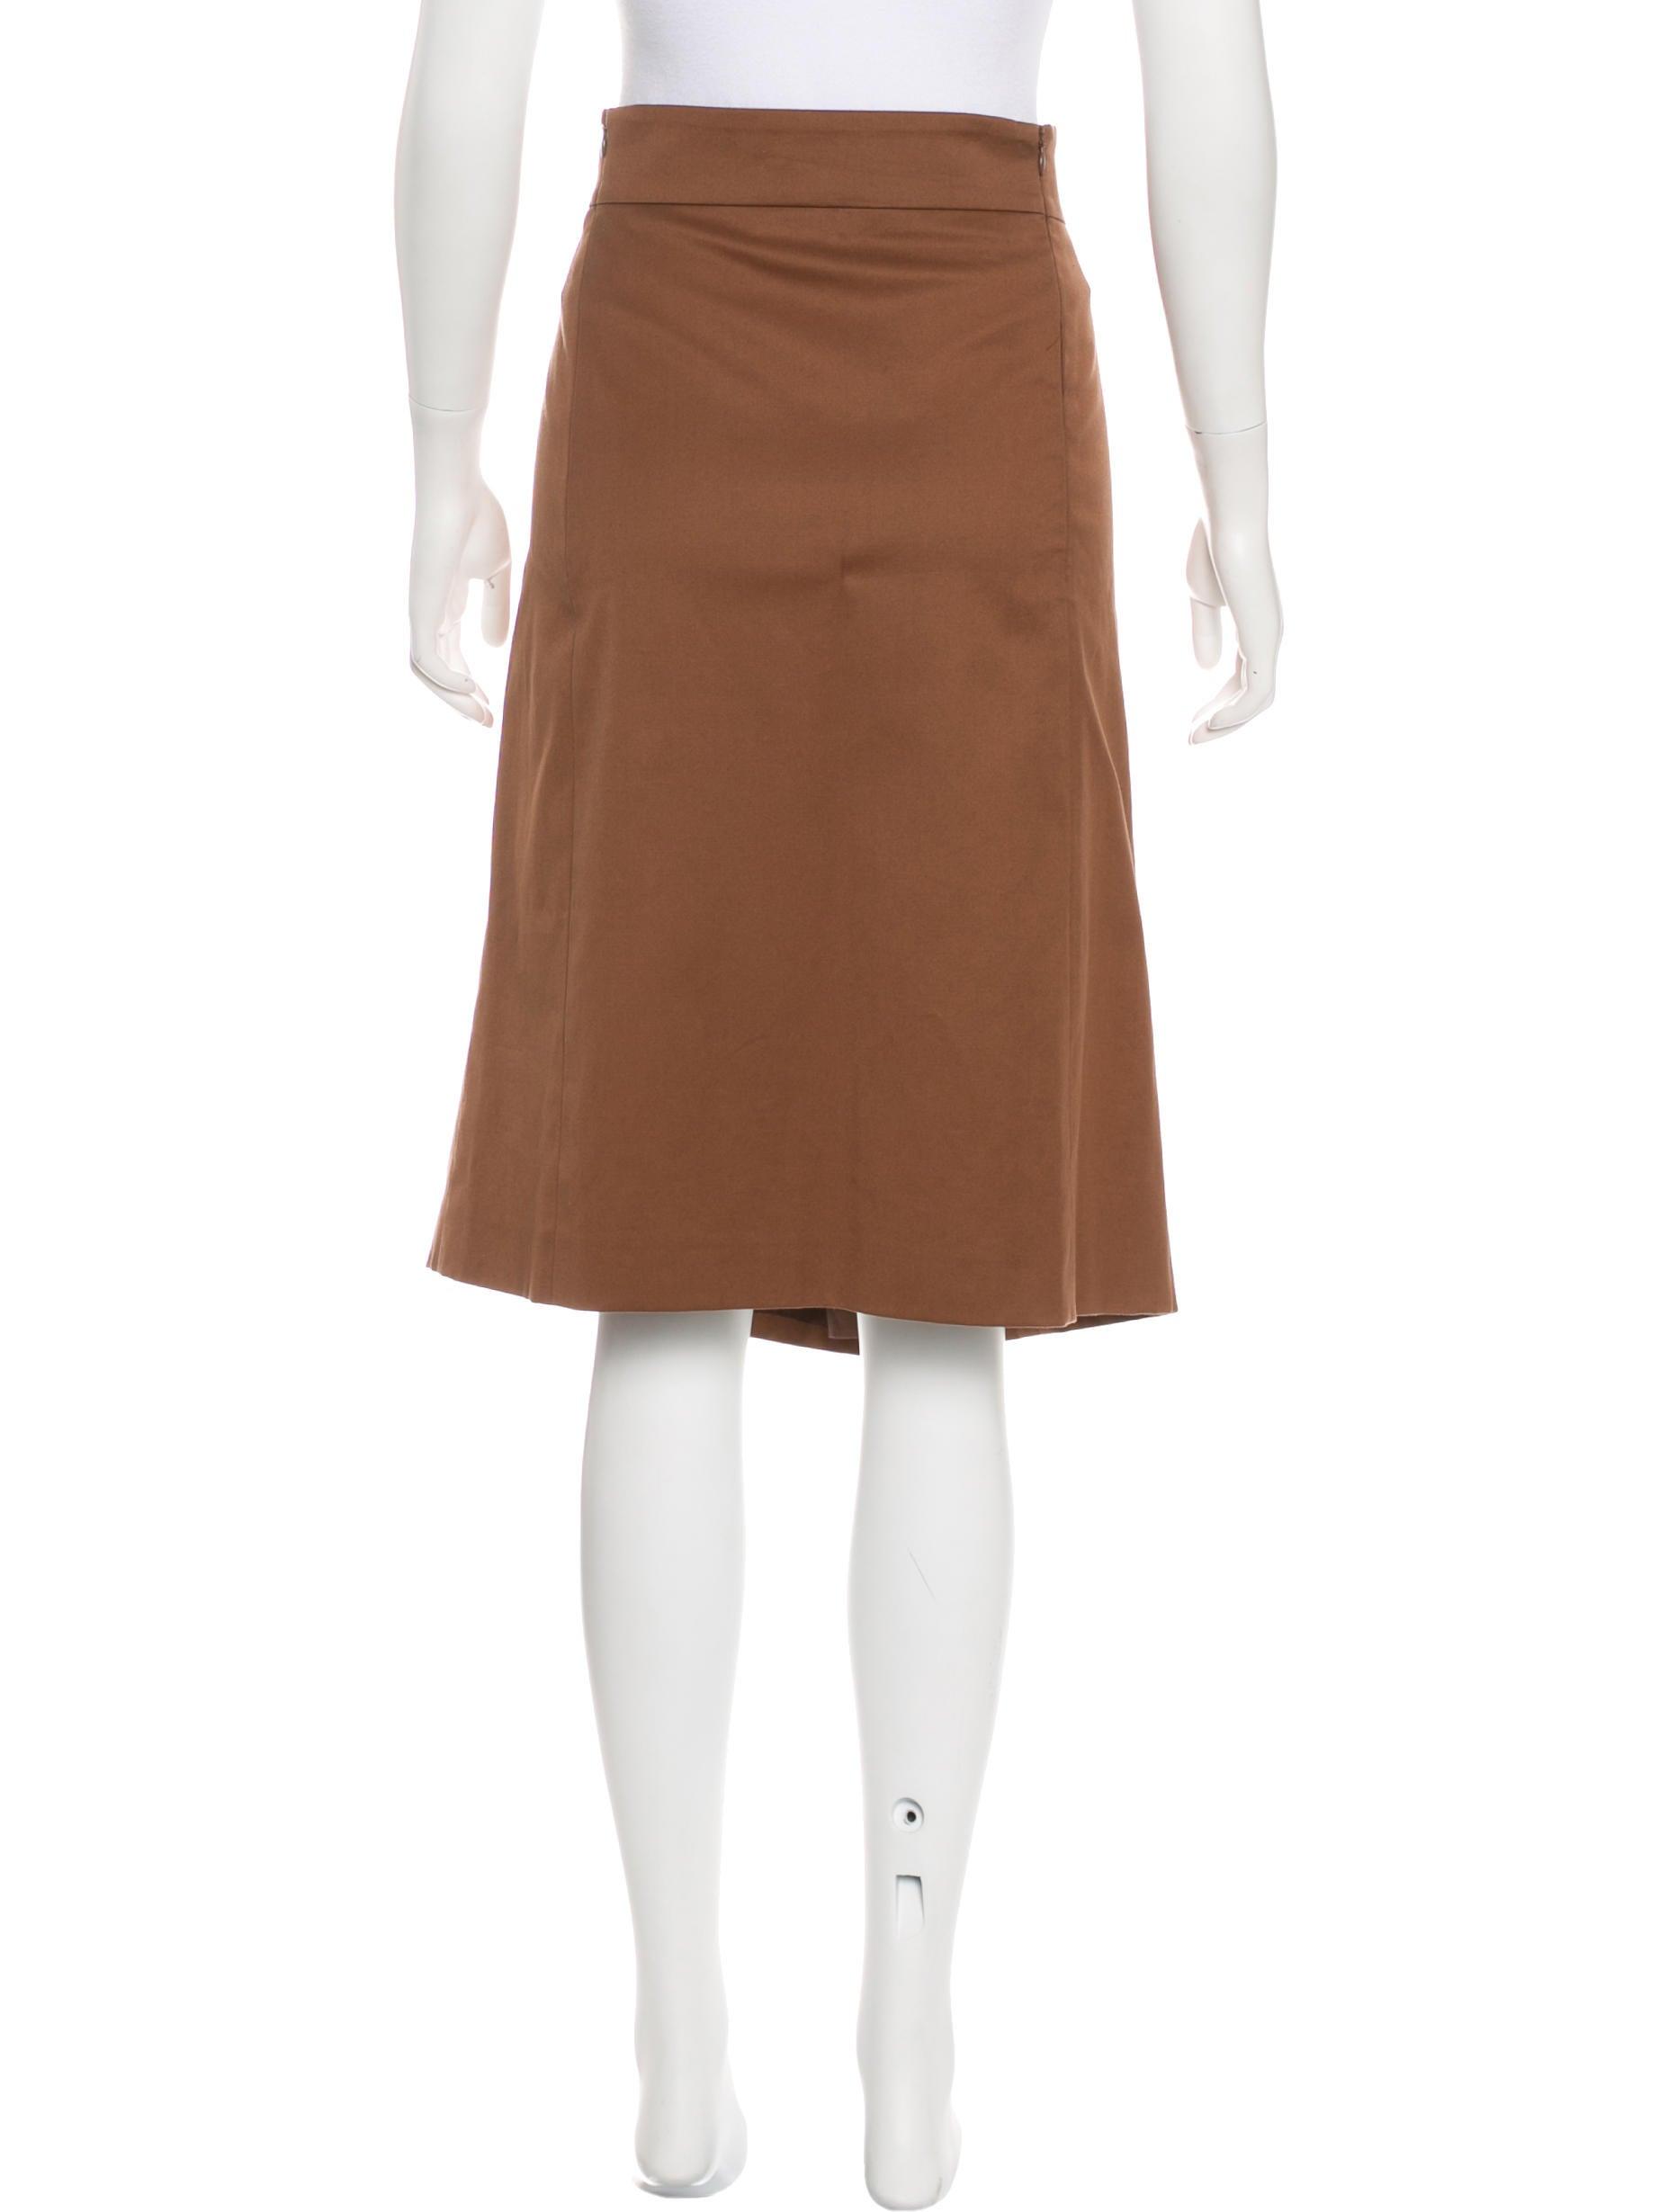 Akris Punto Knee-Length Pencil Skirt - Clothing